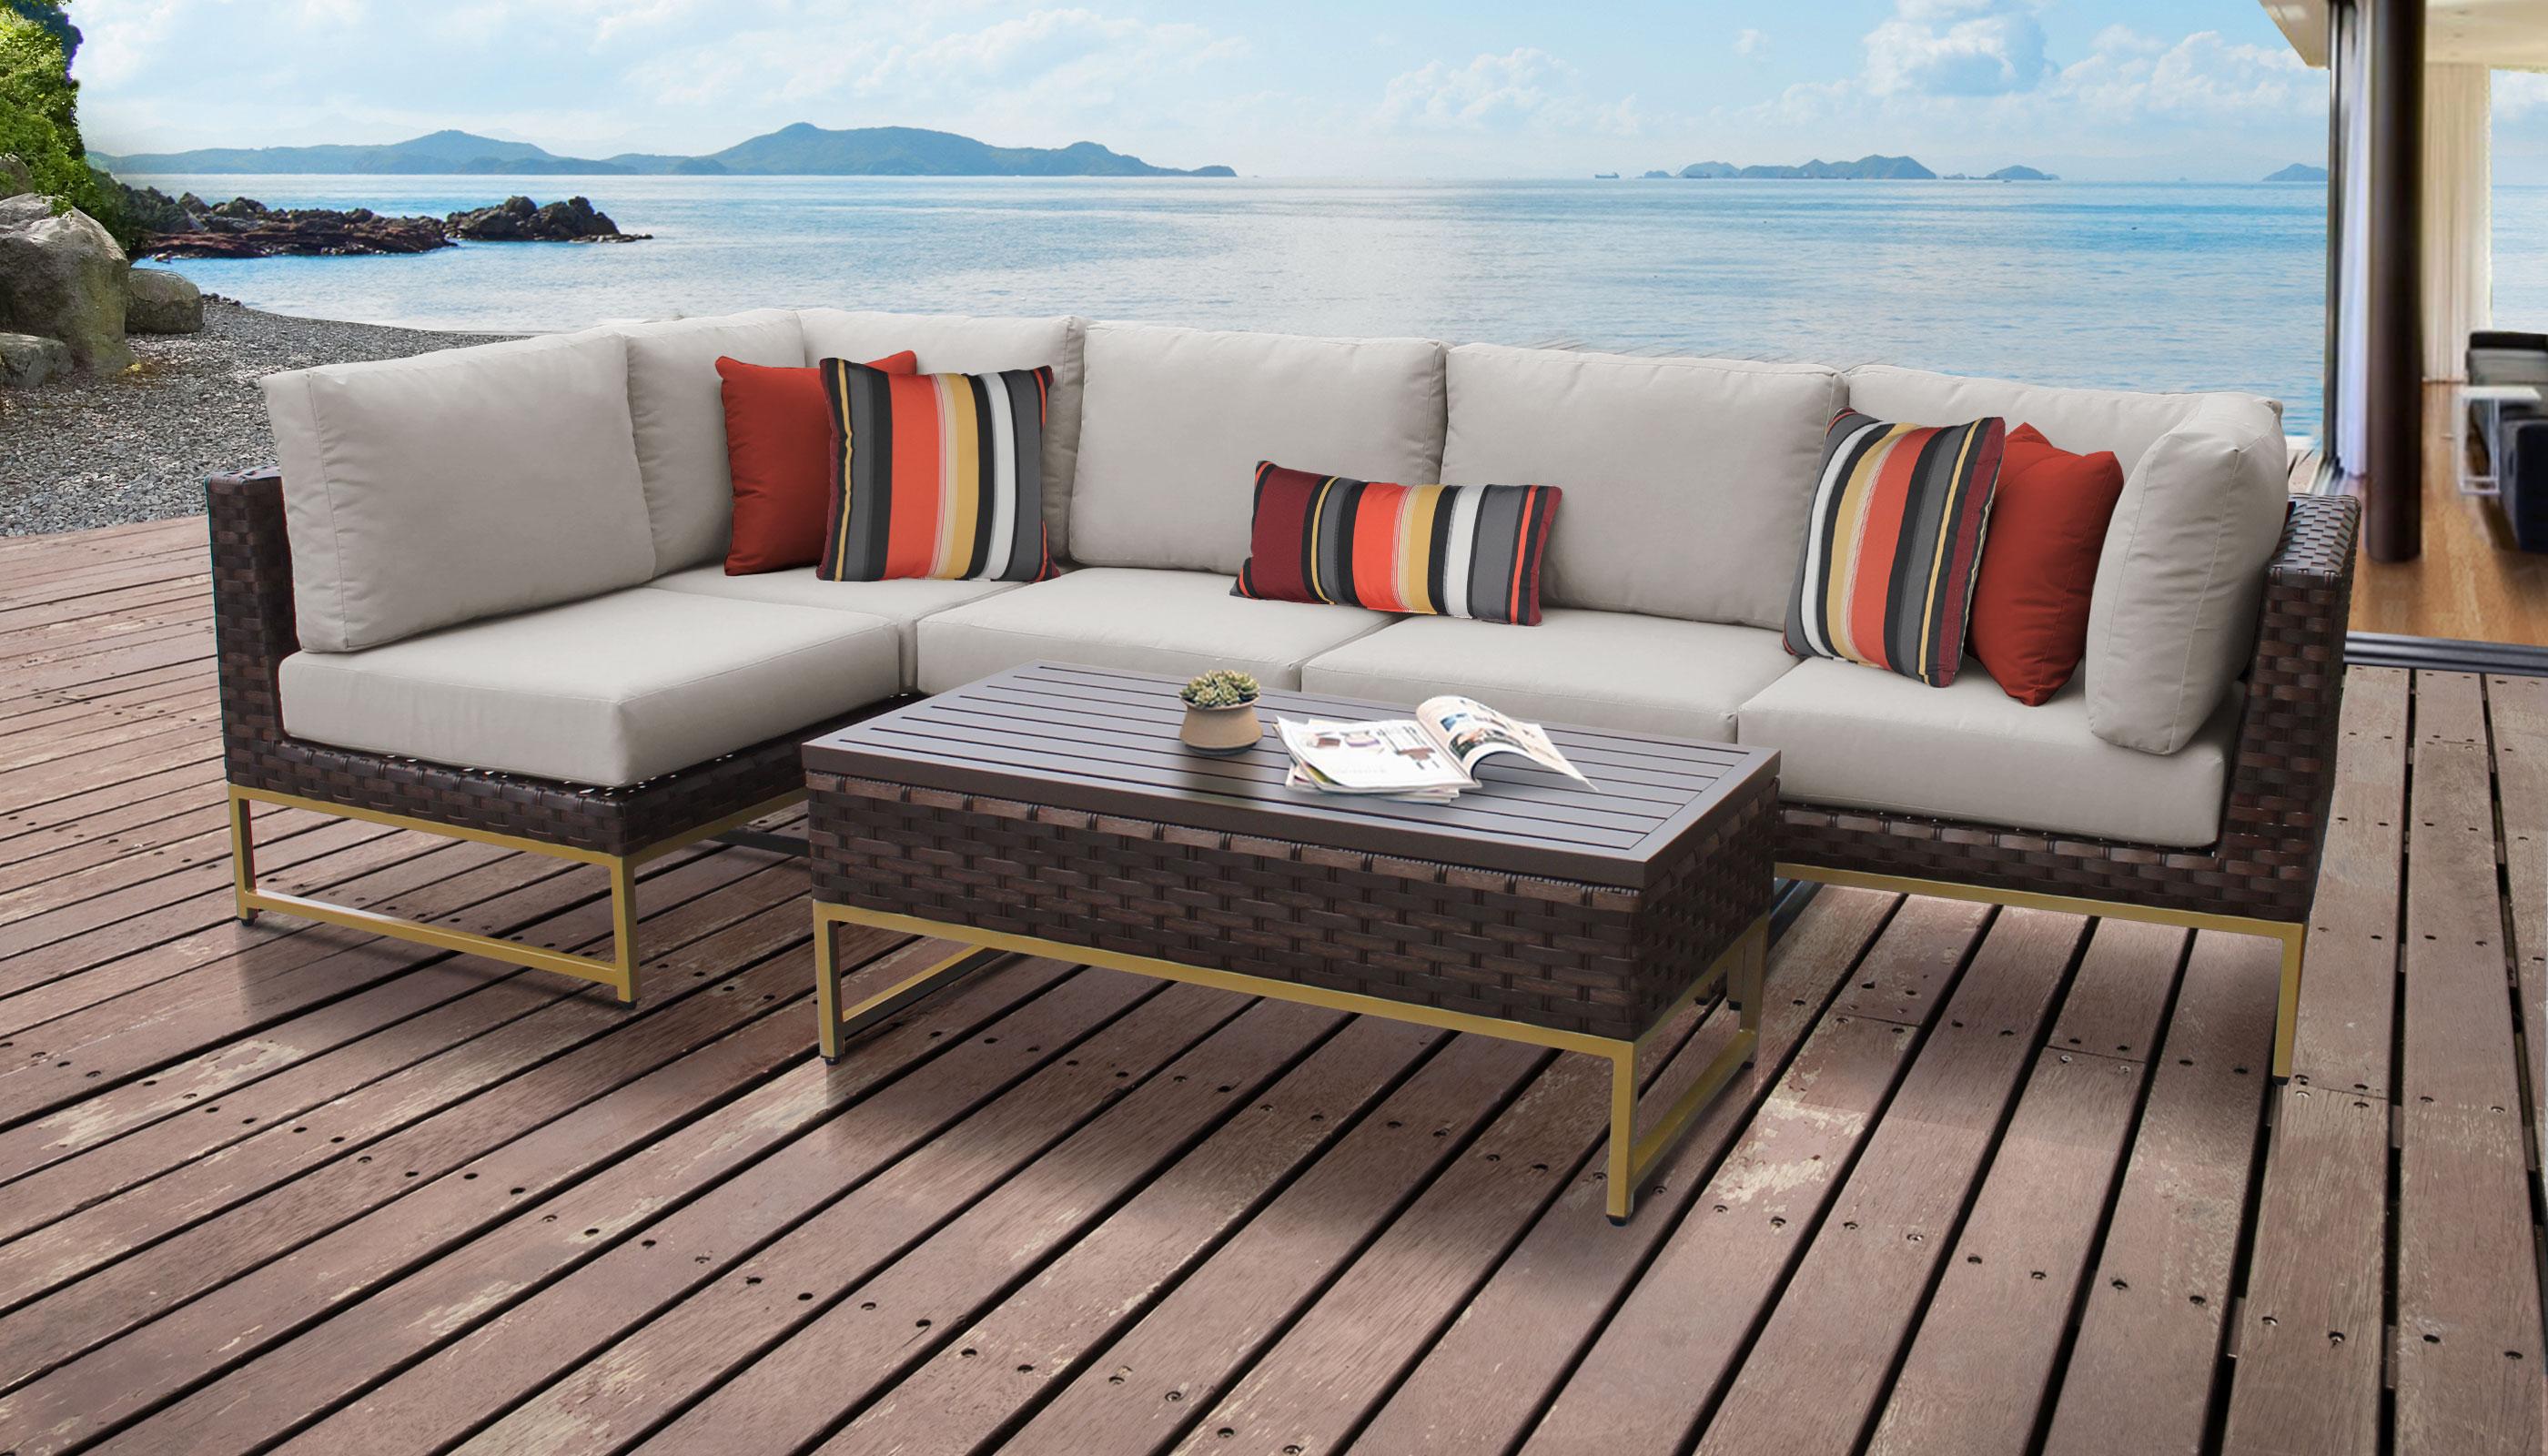 Barcelona 6 Piece Outdoor Wicker Patio Furniture Set 06q